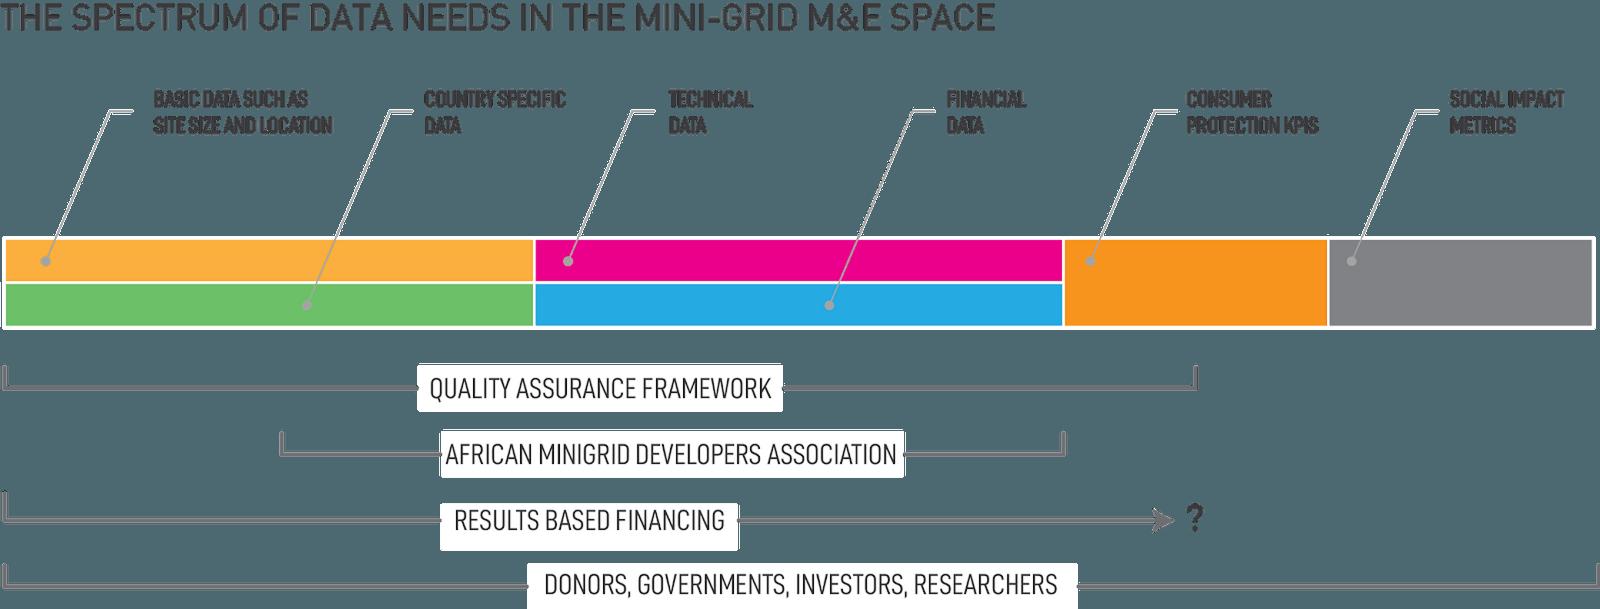 Microgrid spectrum of data needs